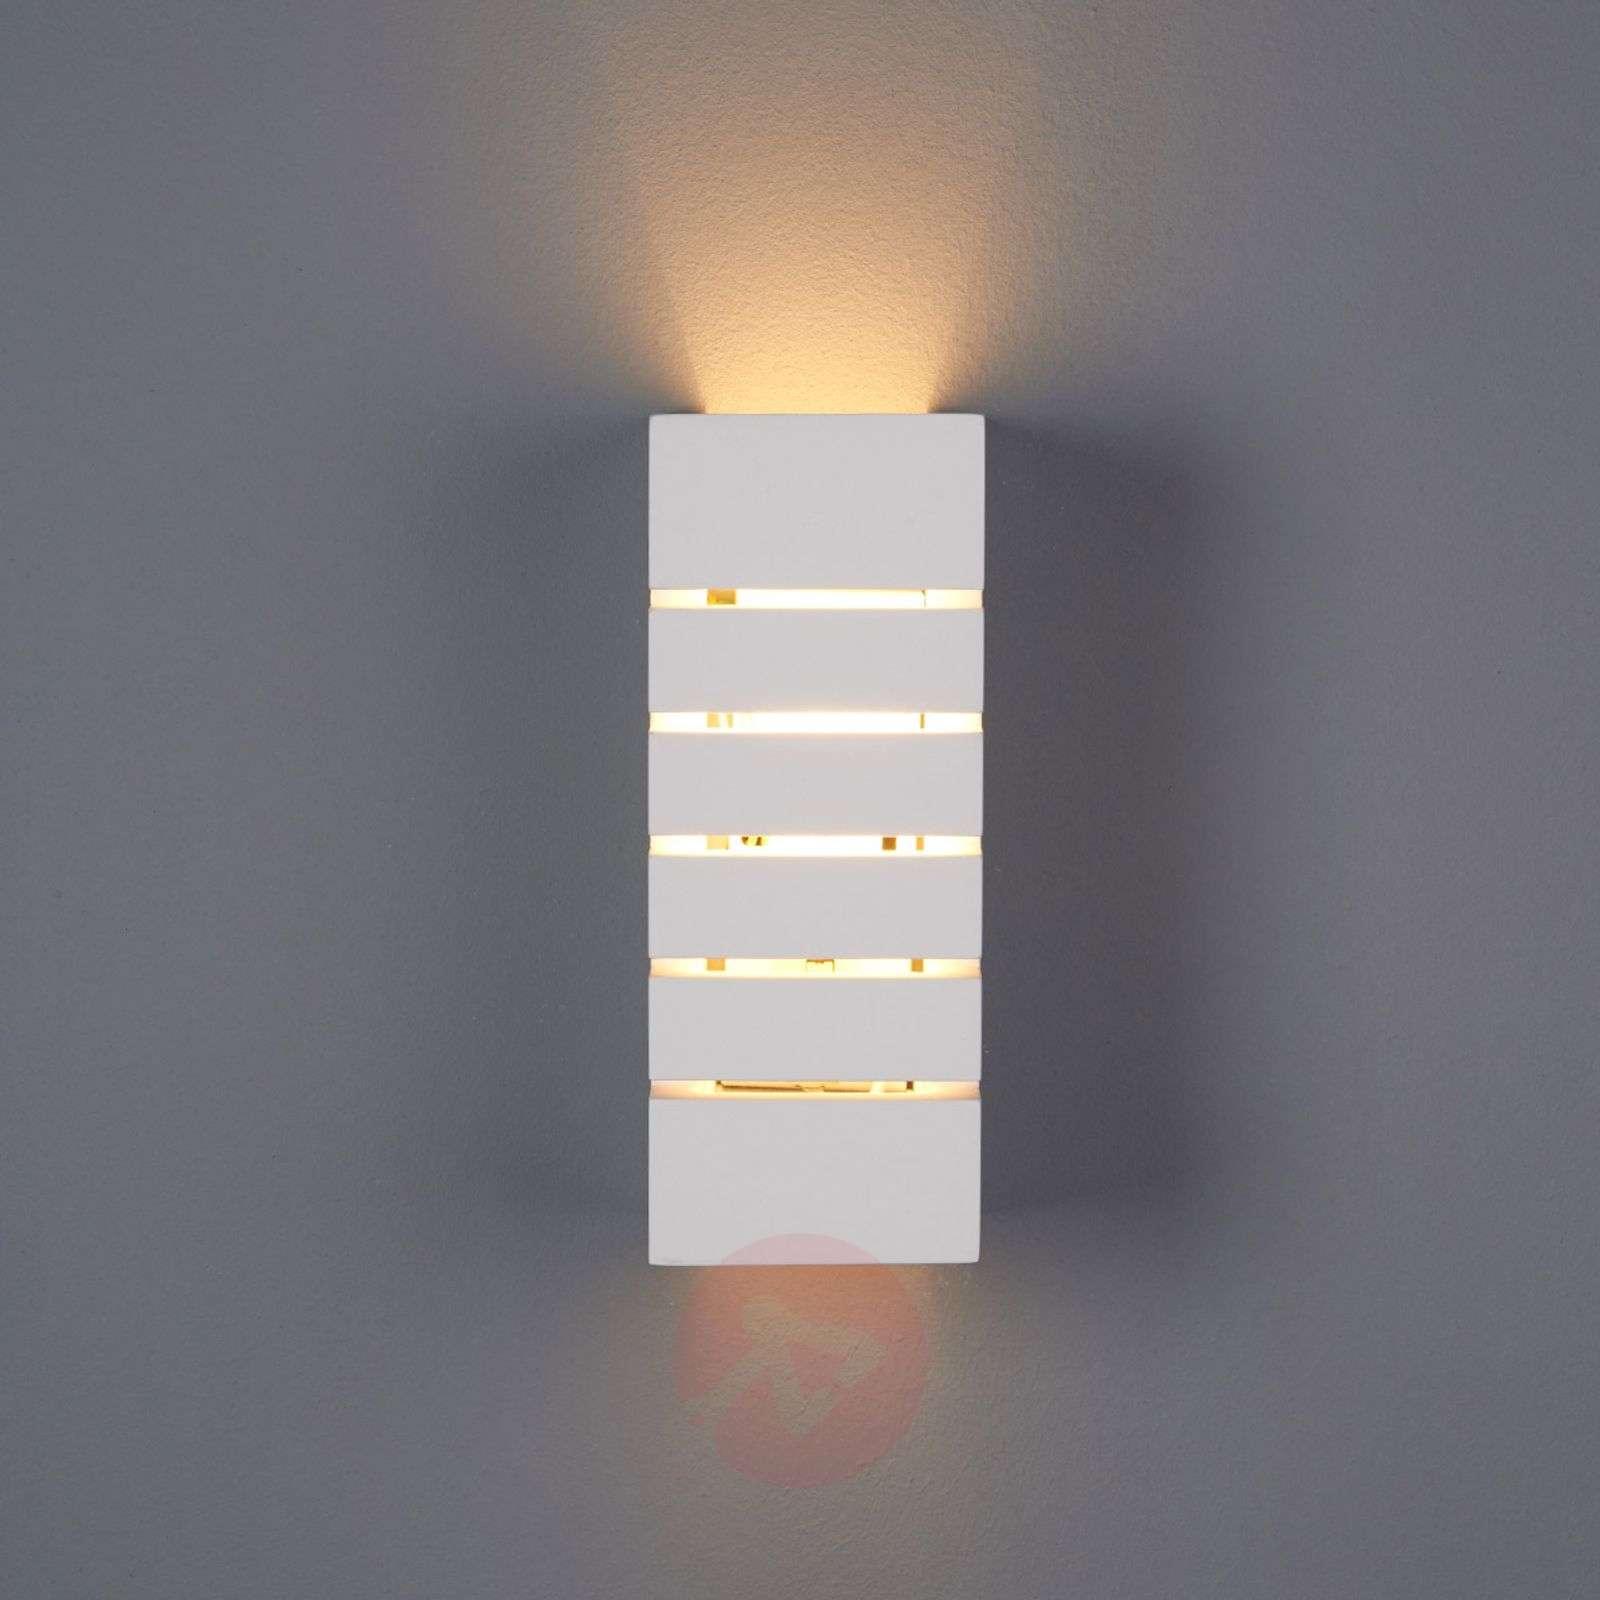 indirect wall lighting. Interesting Indirect Flavian Wall Light With Slots961301001 Lighting . I